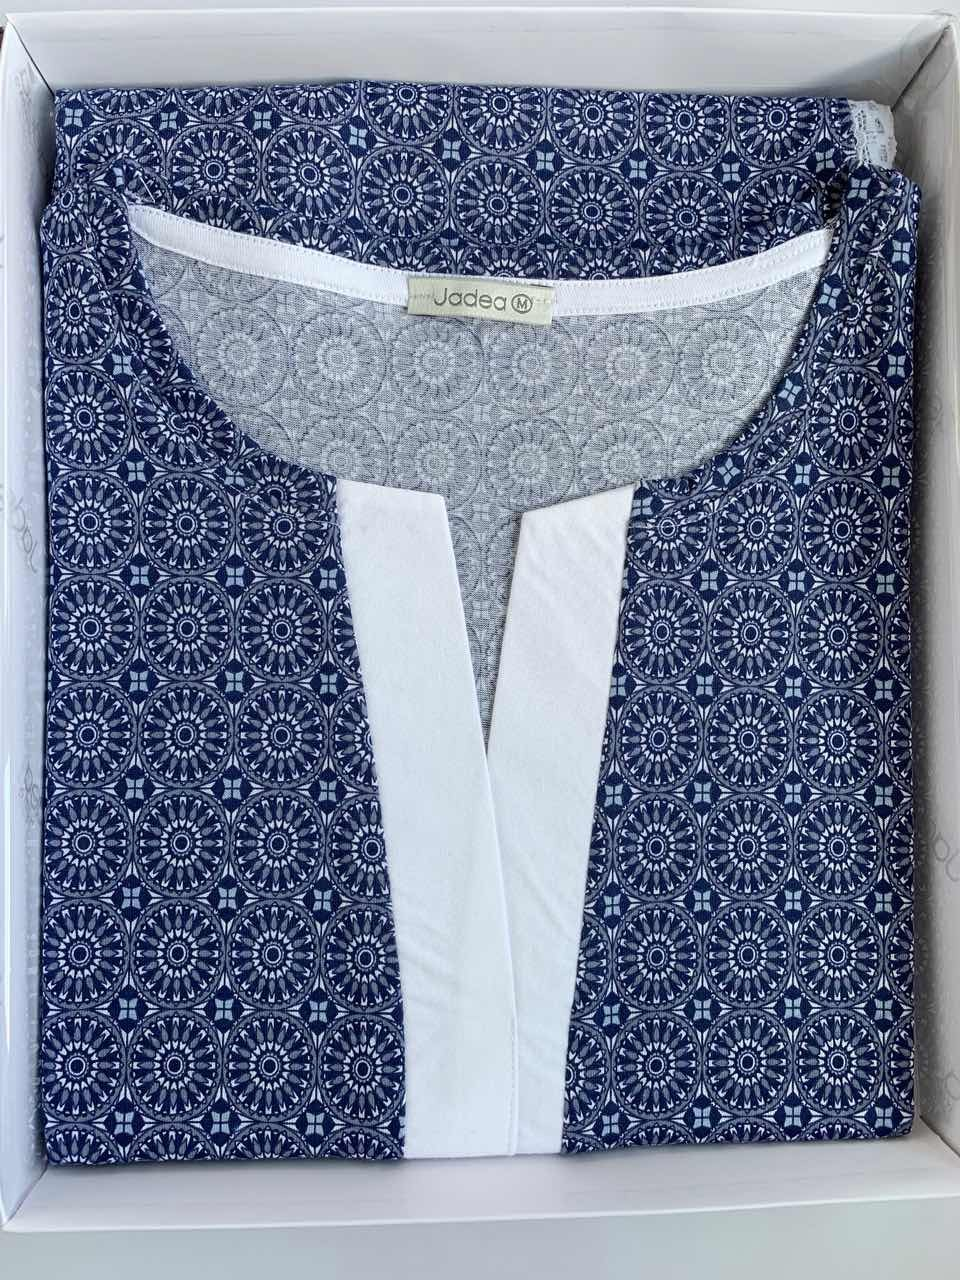 6f9feae5feaf Jadea 3081 blu Пижама/домашний костюм Corto трусы купить, Jadea 3081 ...